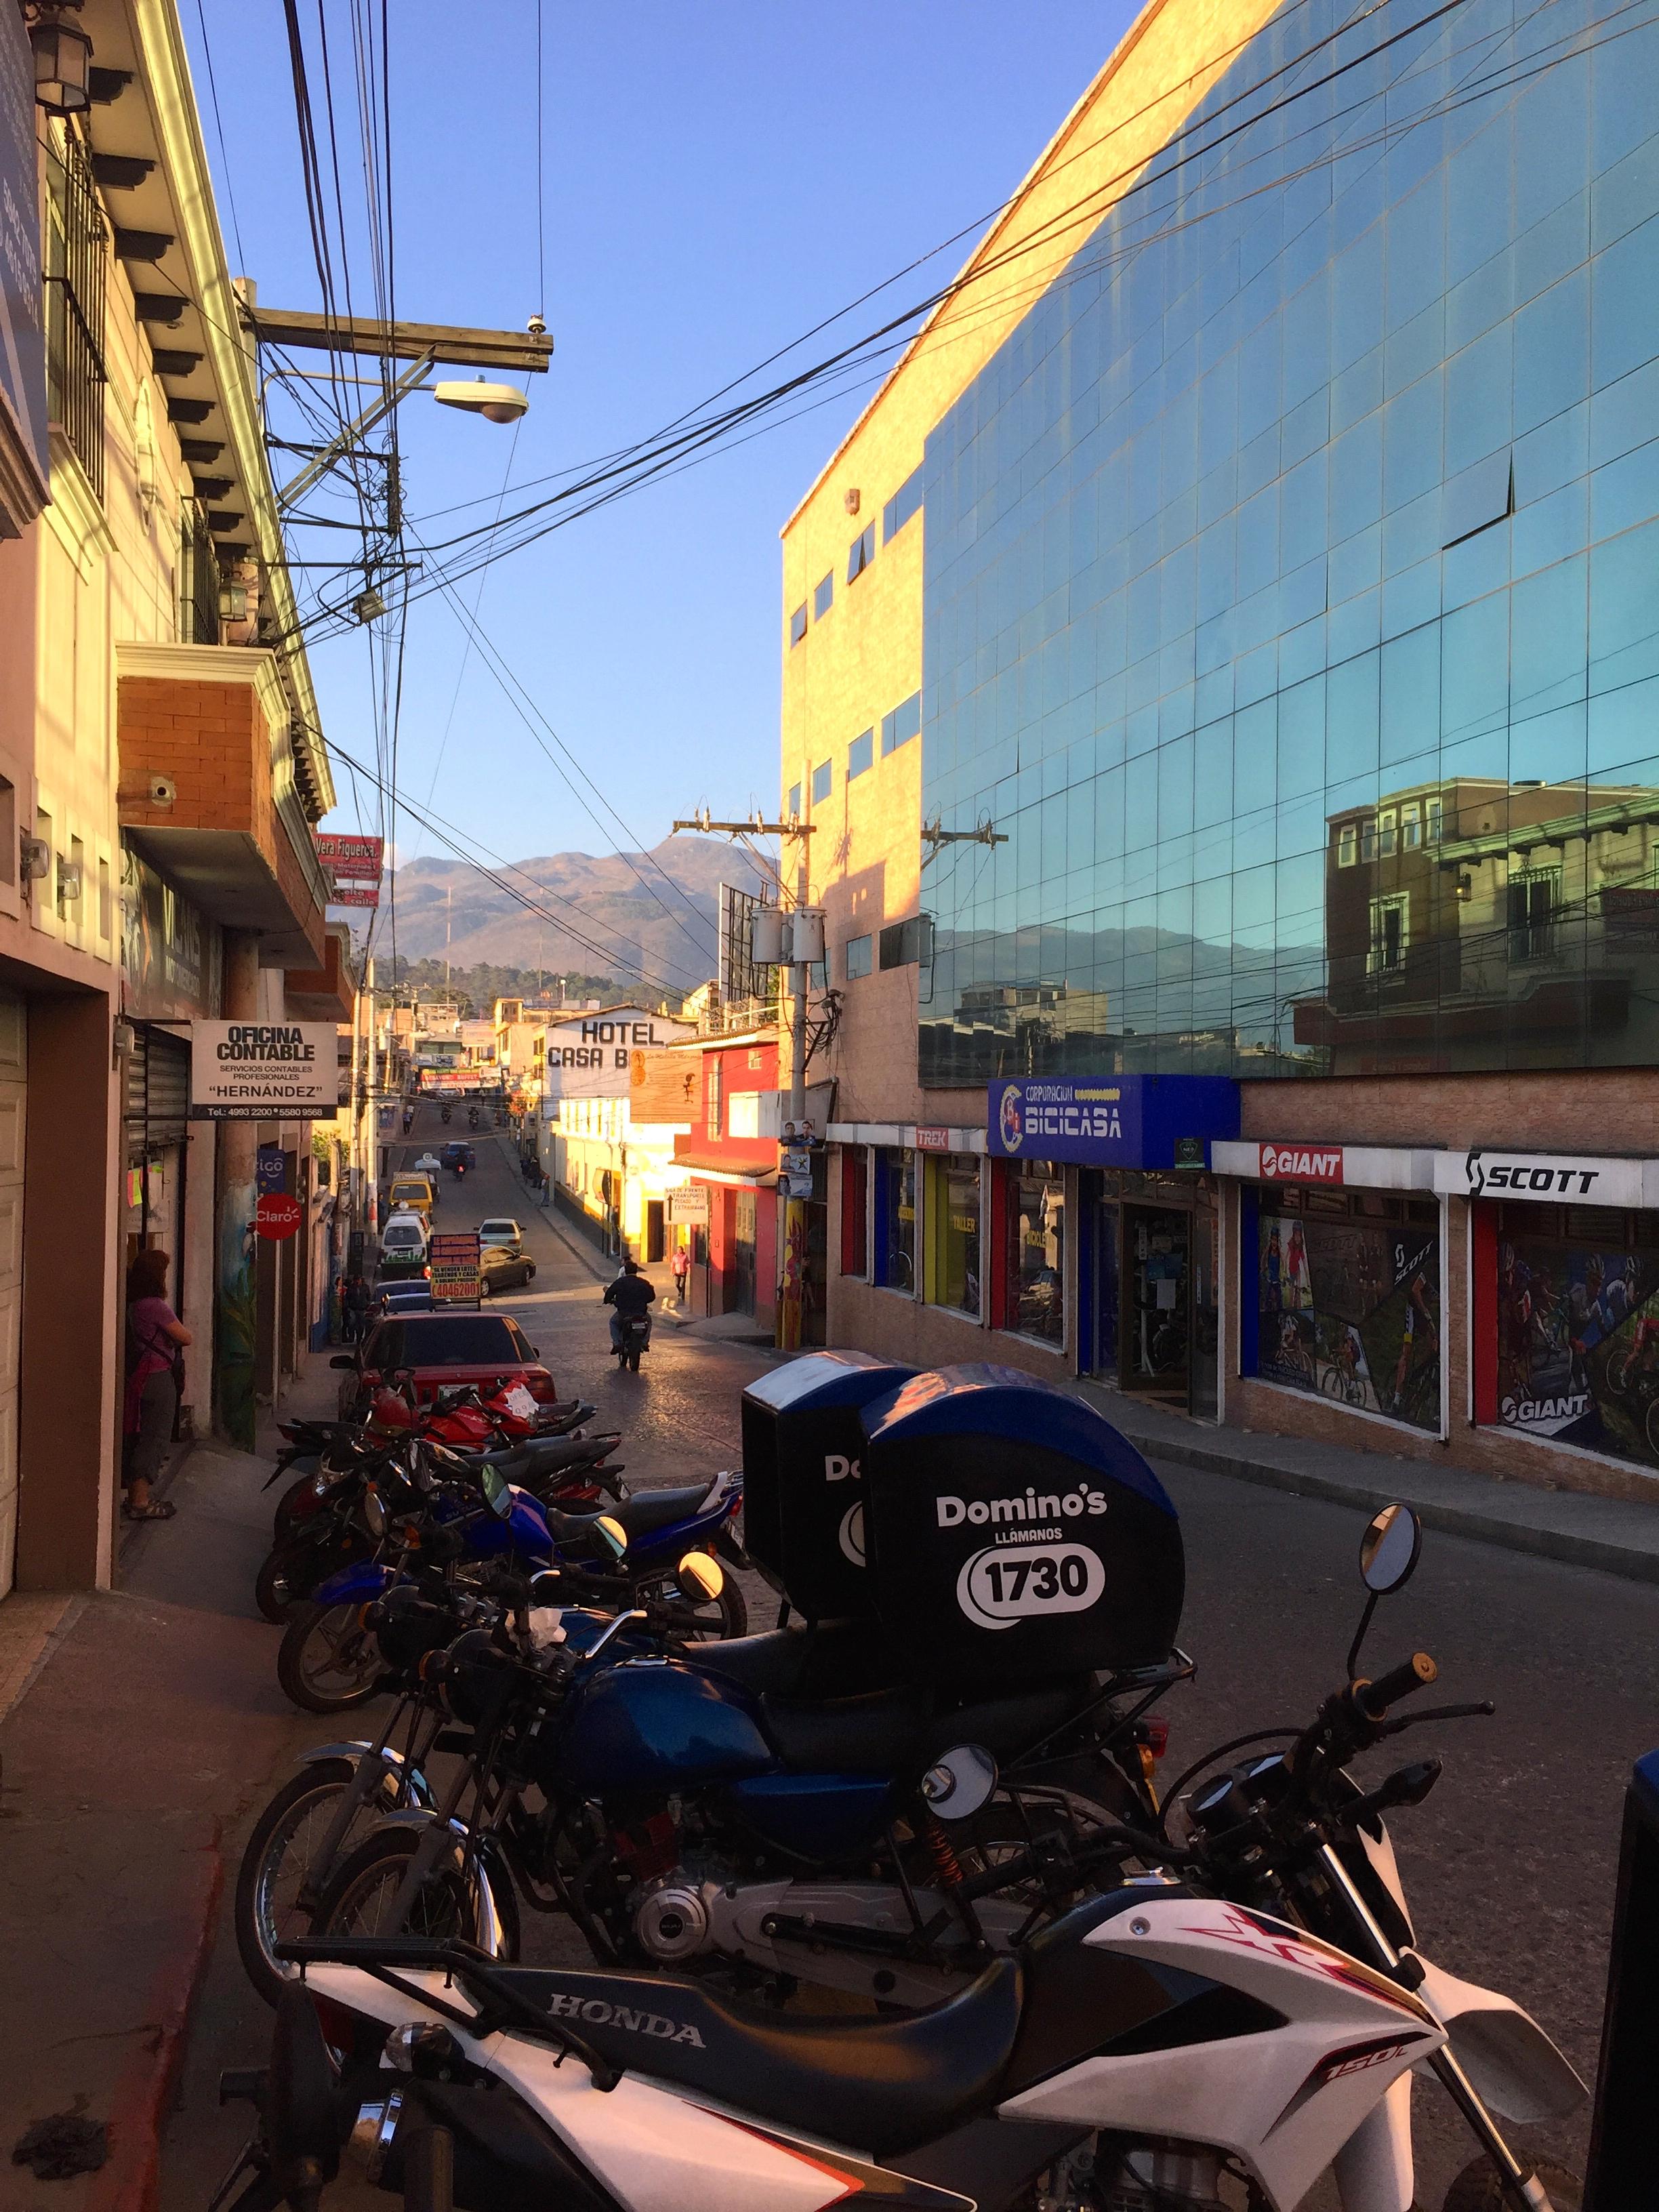 Our first Guatemala city...Huehuetenango